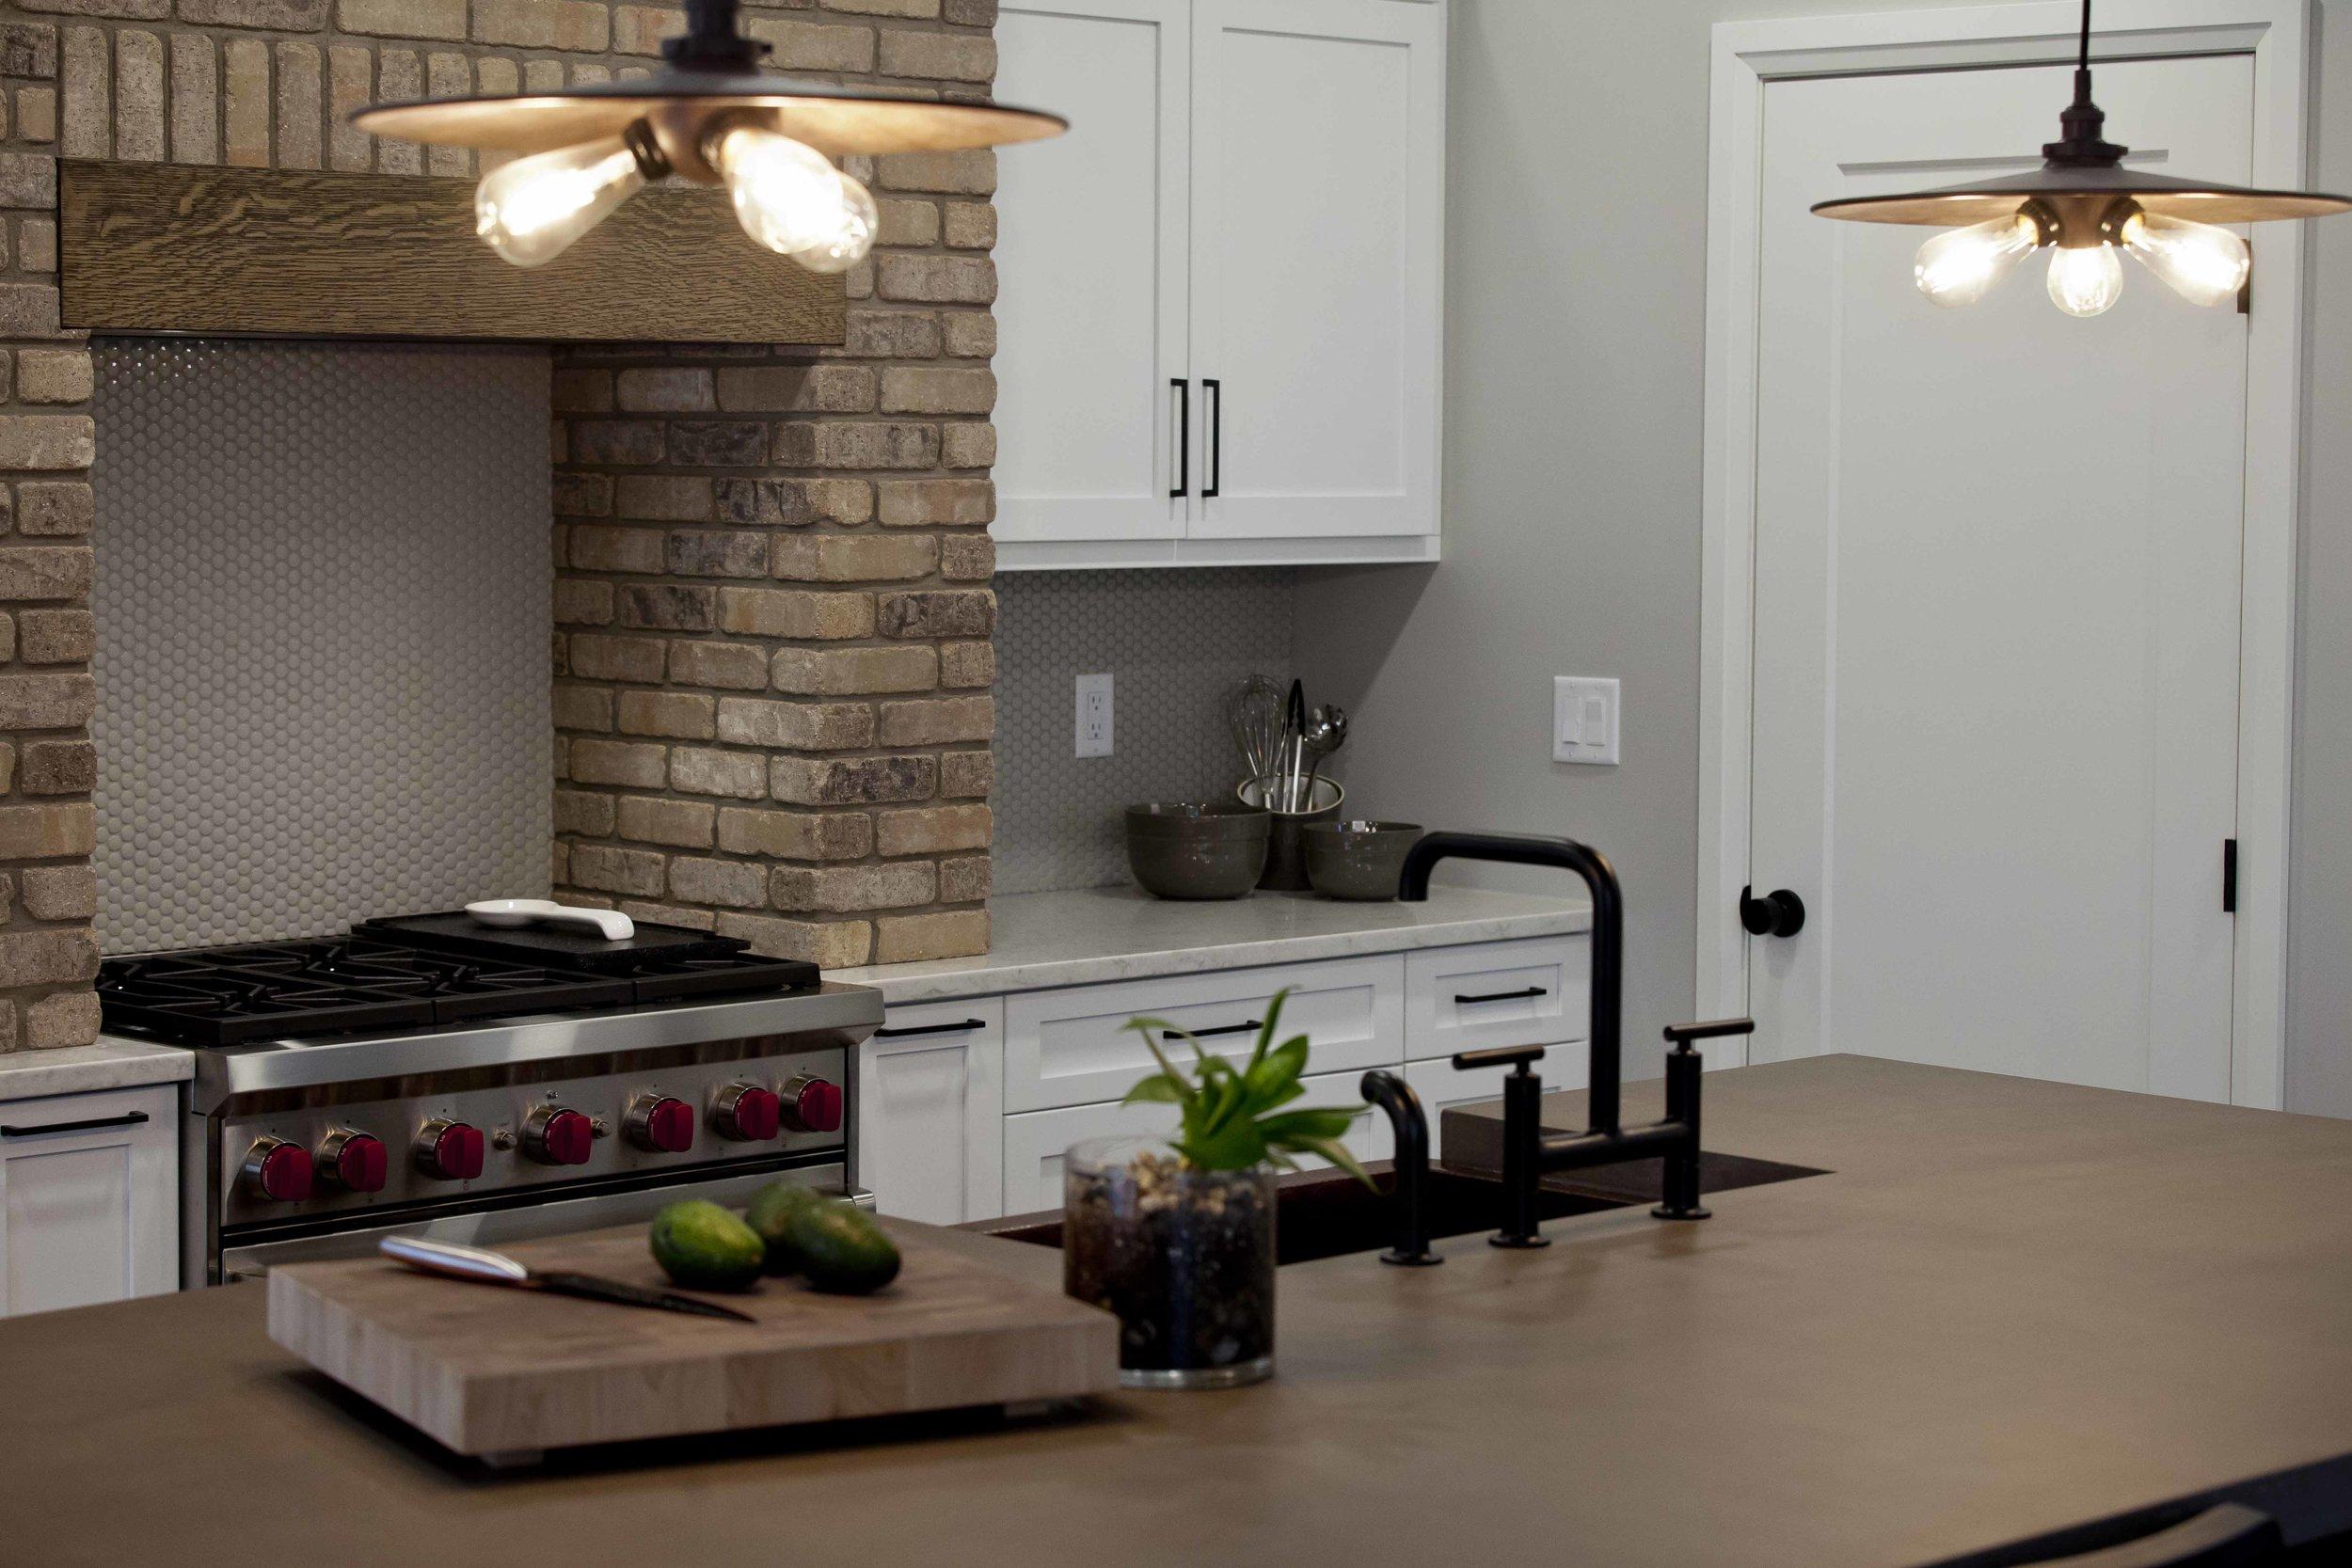 Workshop Cabinets & Design Camrose Alberta Interior Design and Cabinetry Custom Home Renovation New Build Interior Designer kitchen open concept Rustic Modern Farmhouse